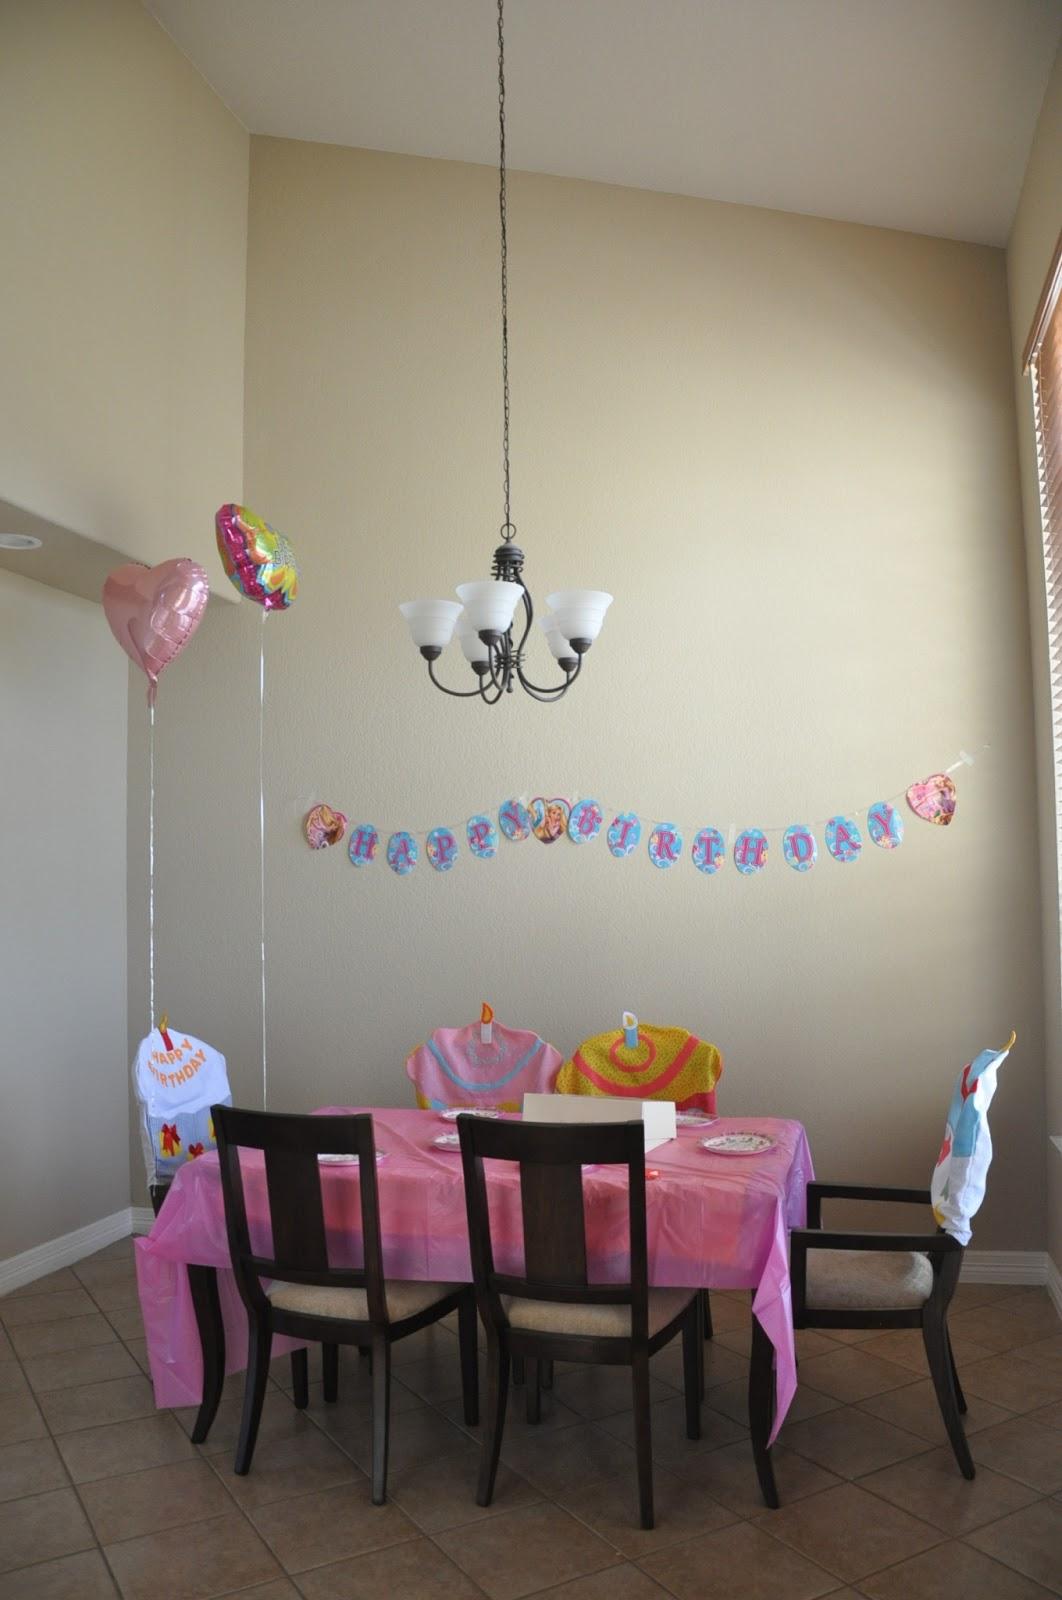 Mam s todoterreno cumplea os feliz - Como decorar un cumpleanos ...